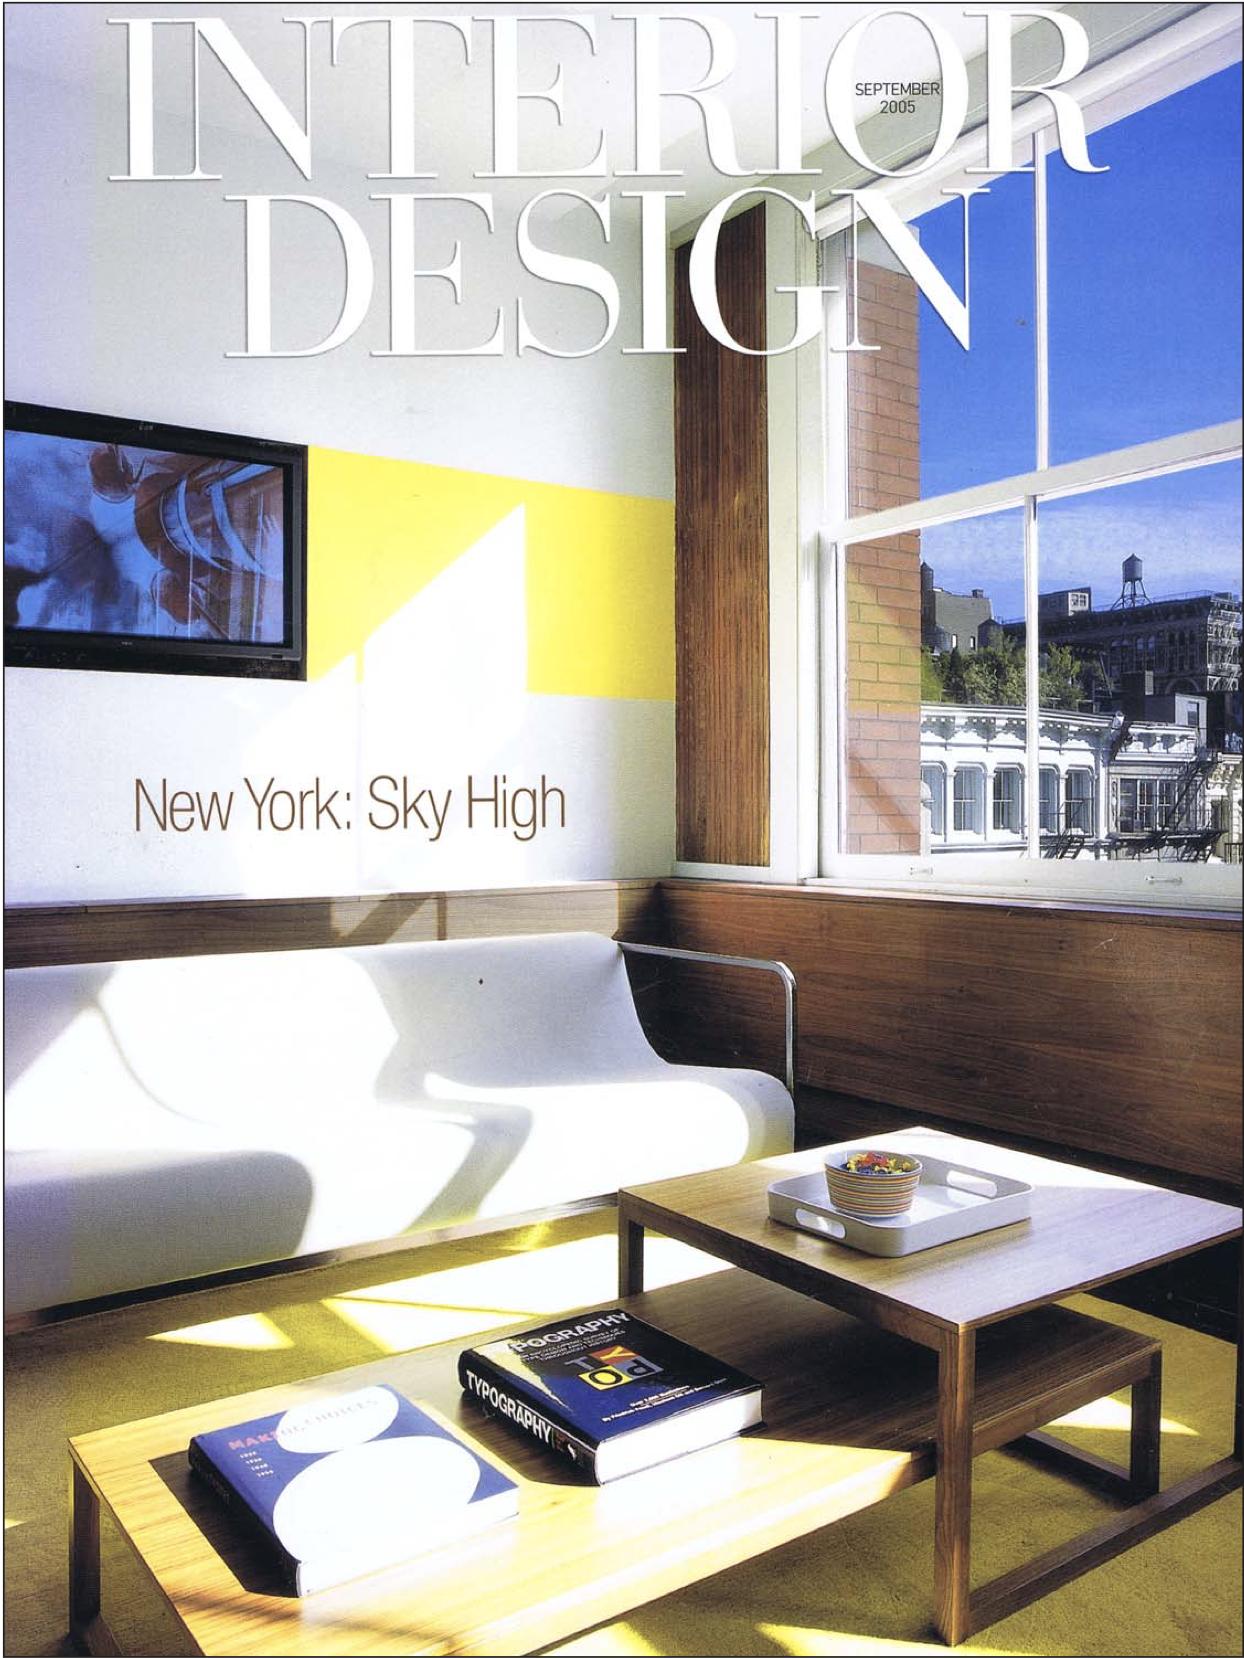 reeta-gyamlani-farrago-design-interior-design-magazine-4